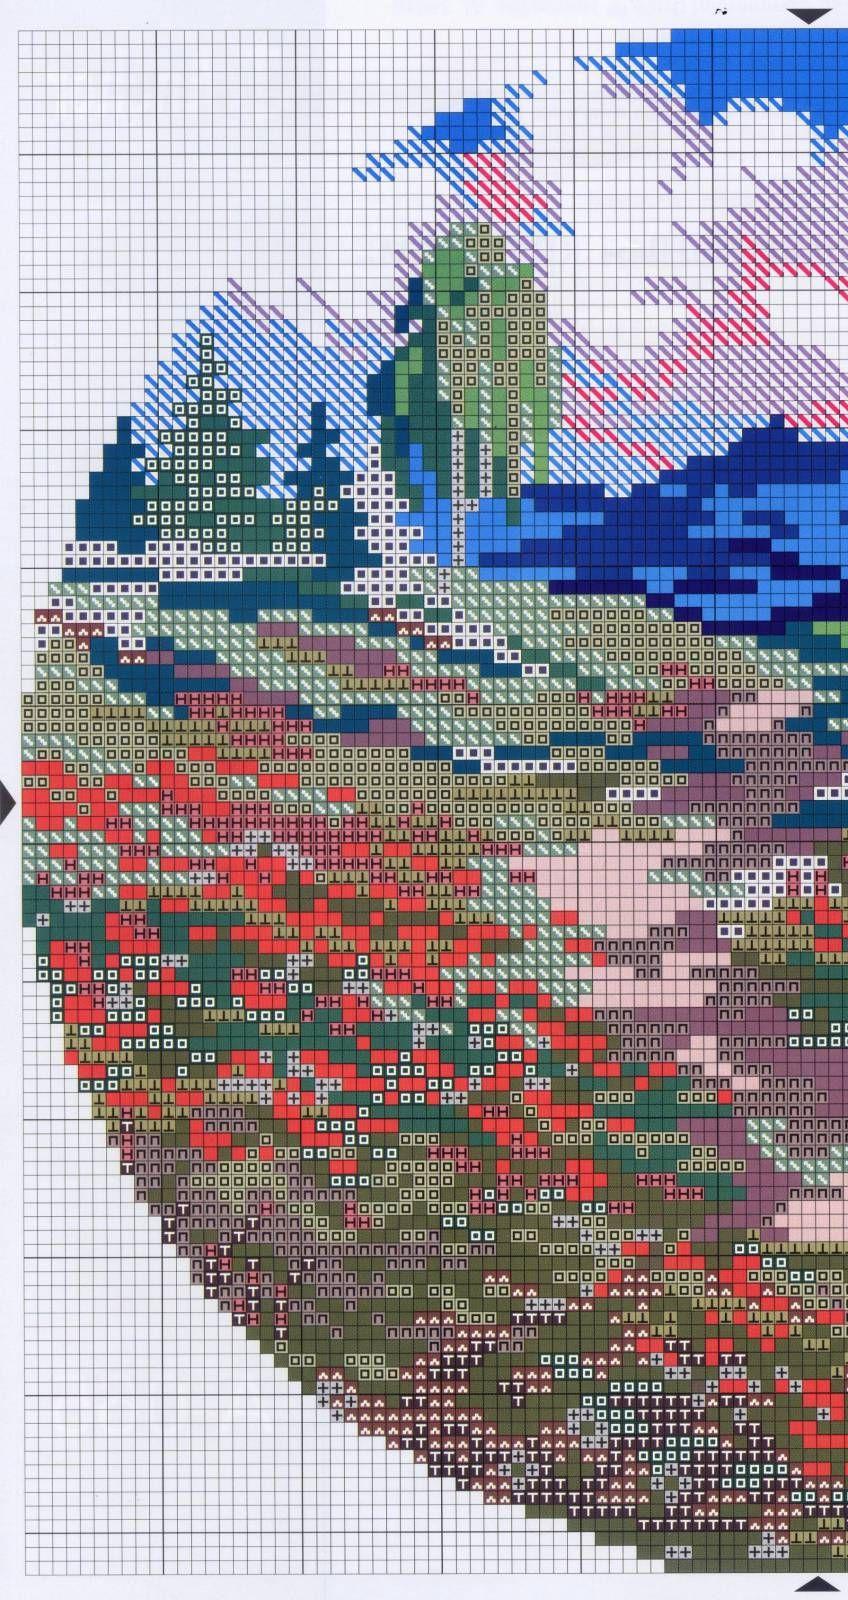 38aaccbefa40520f6c703a4cc21575bc5cf3b5129311129.jpg (848×1600)